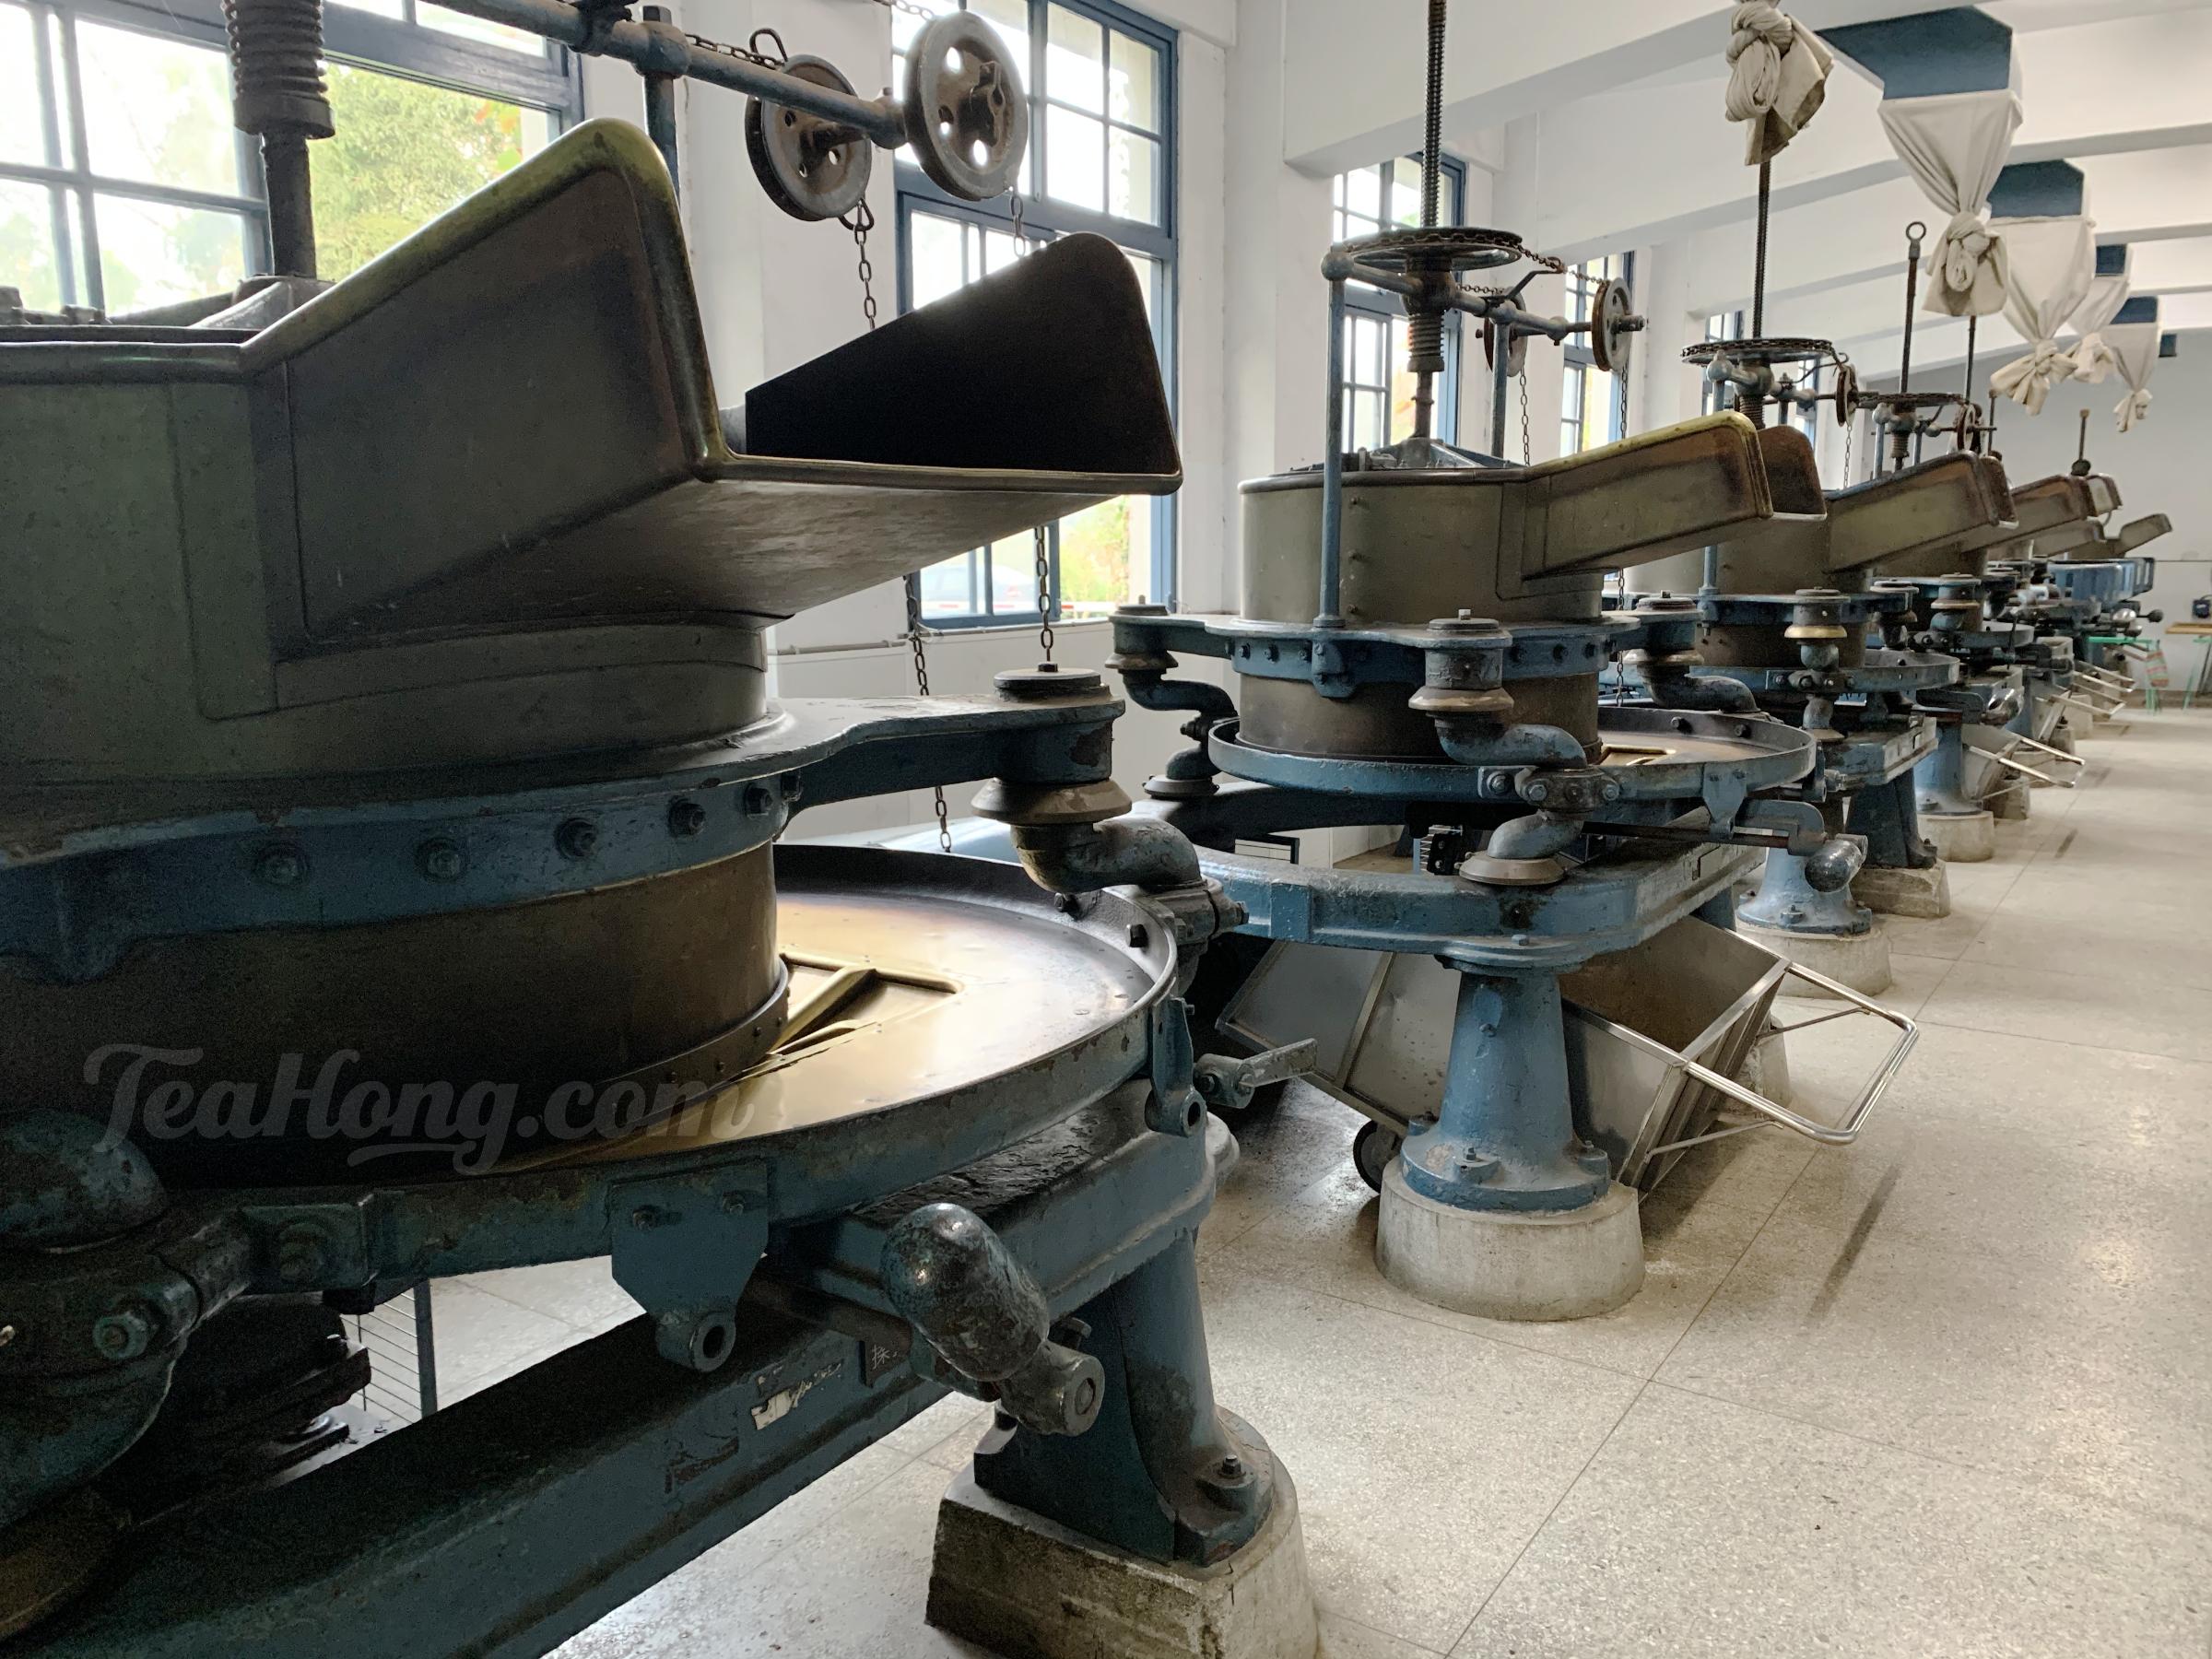 Old tea rolling machines